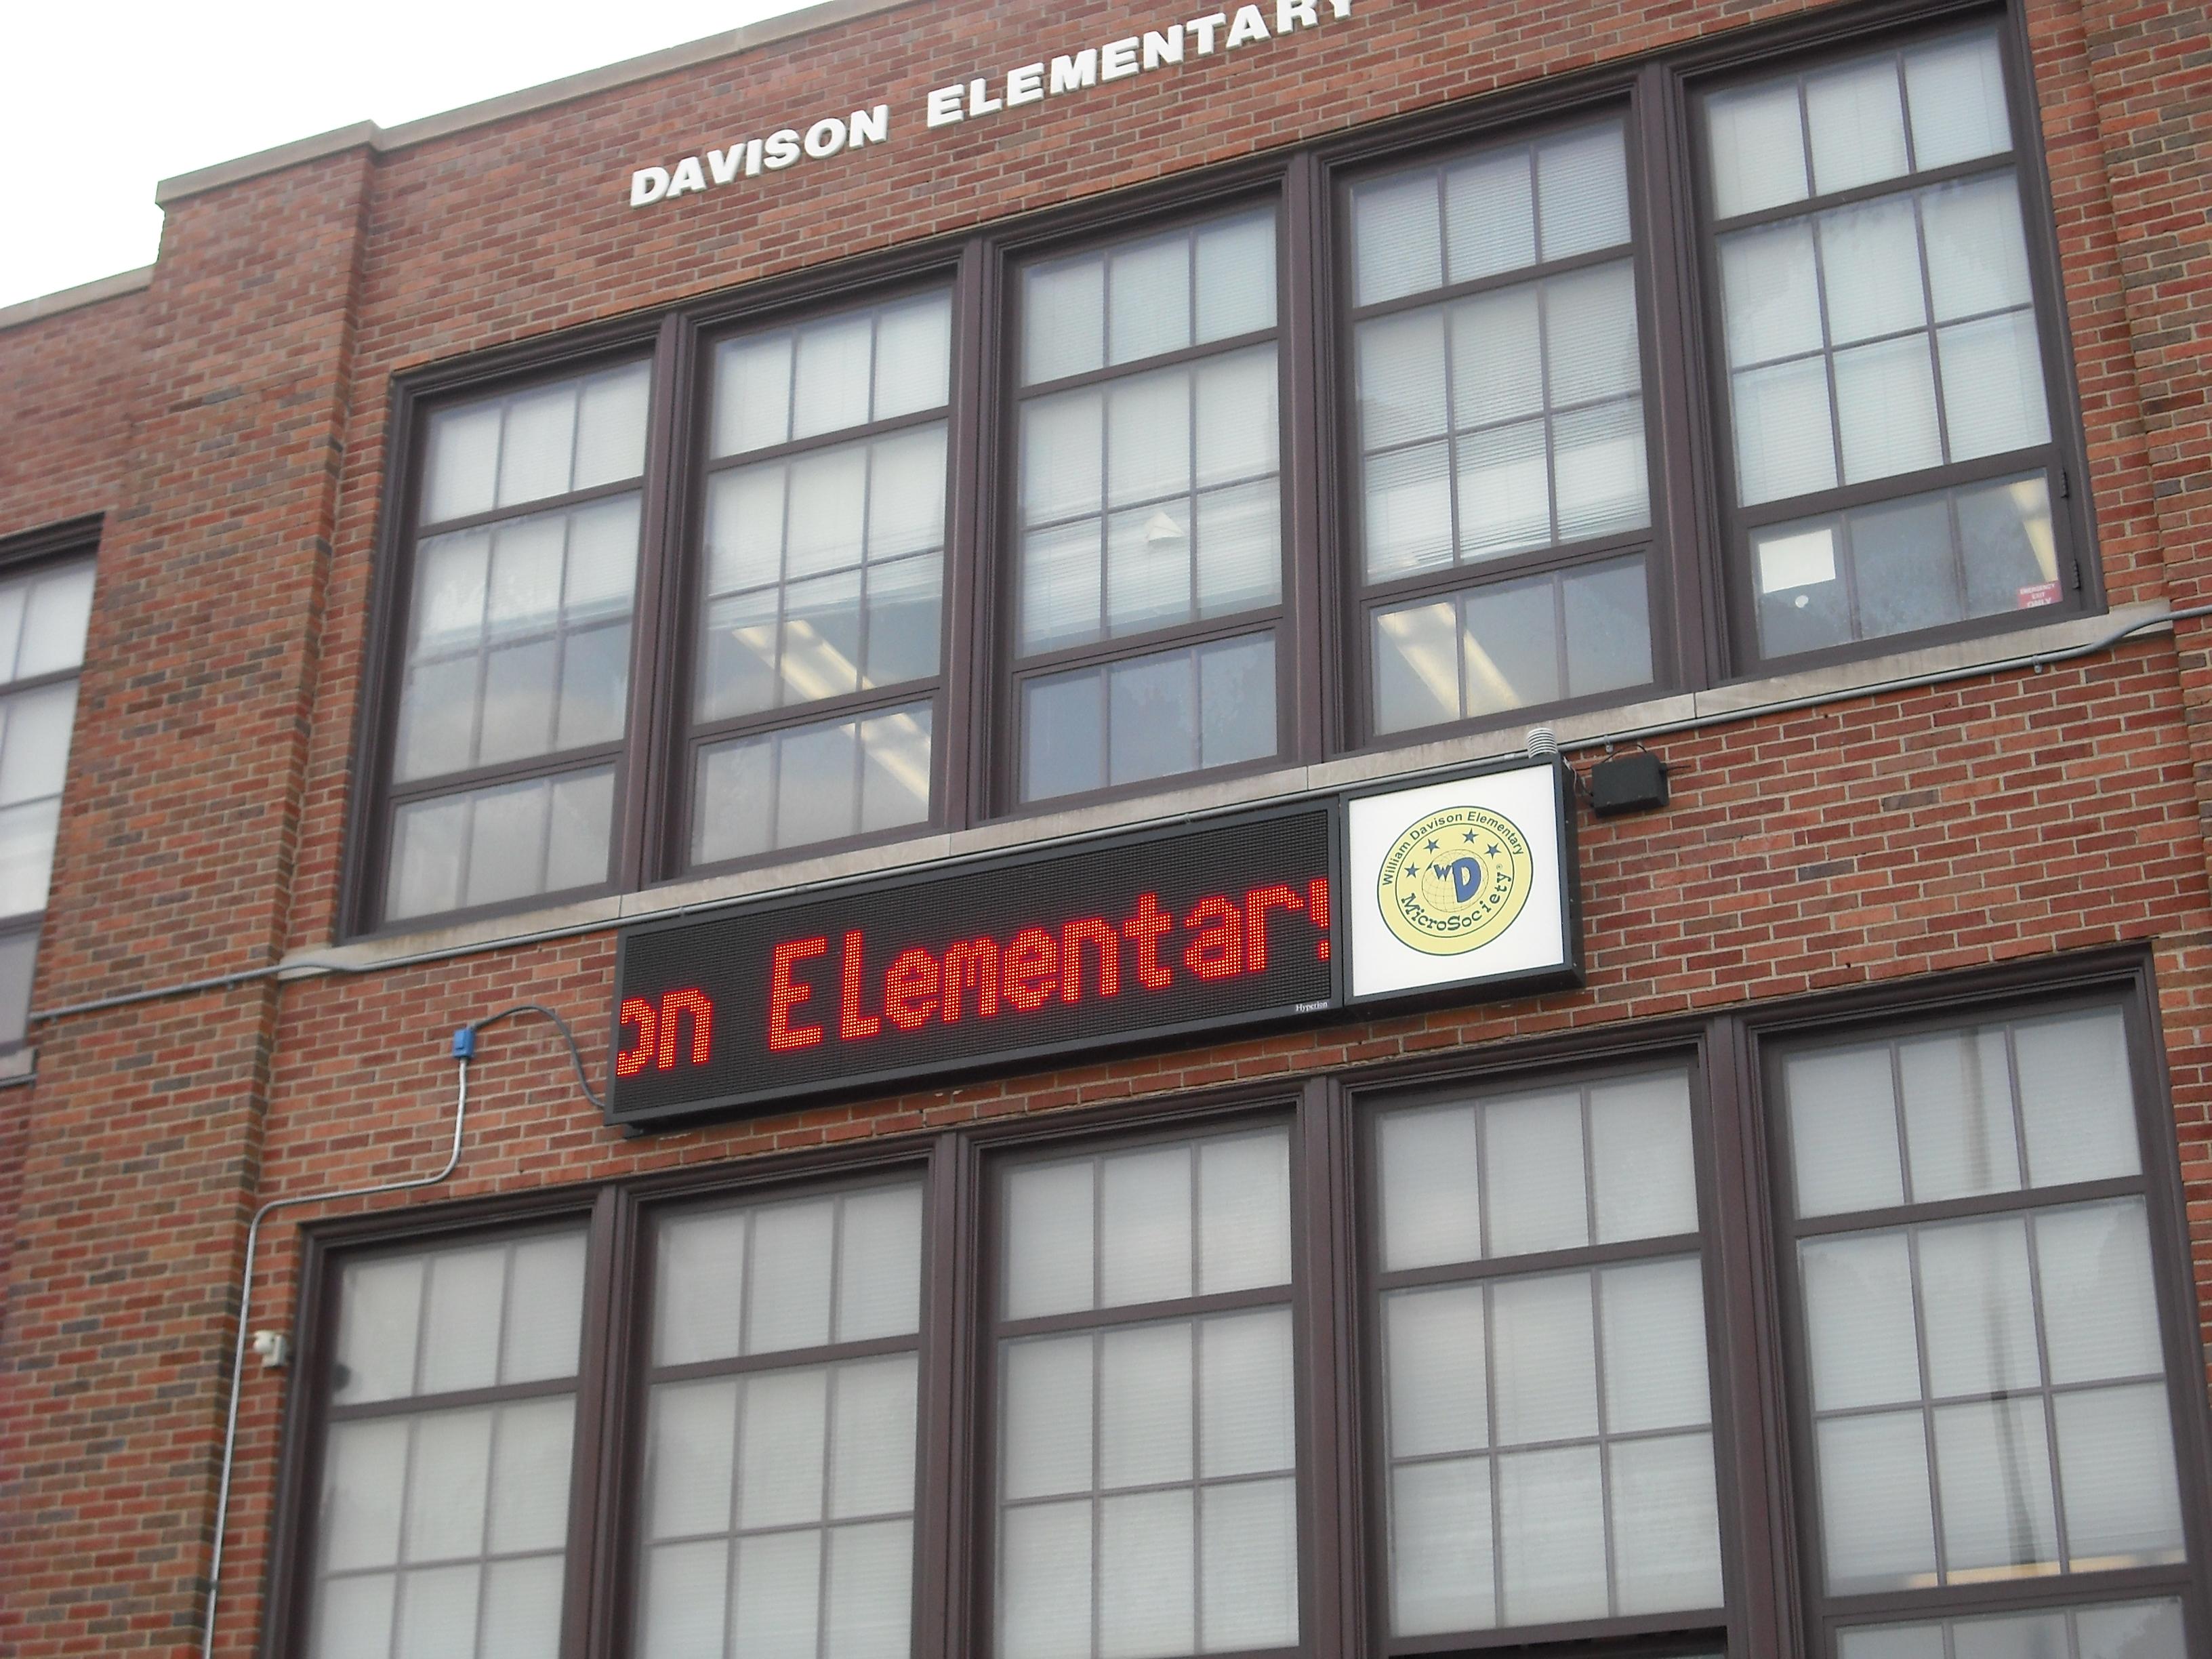 Davison Elementary School